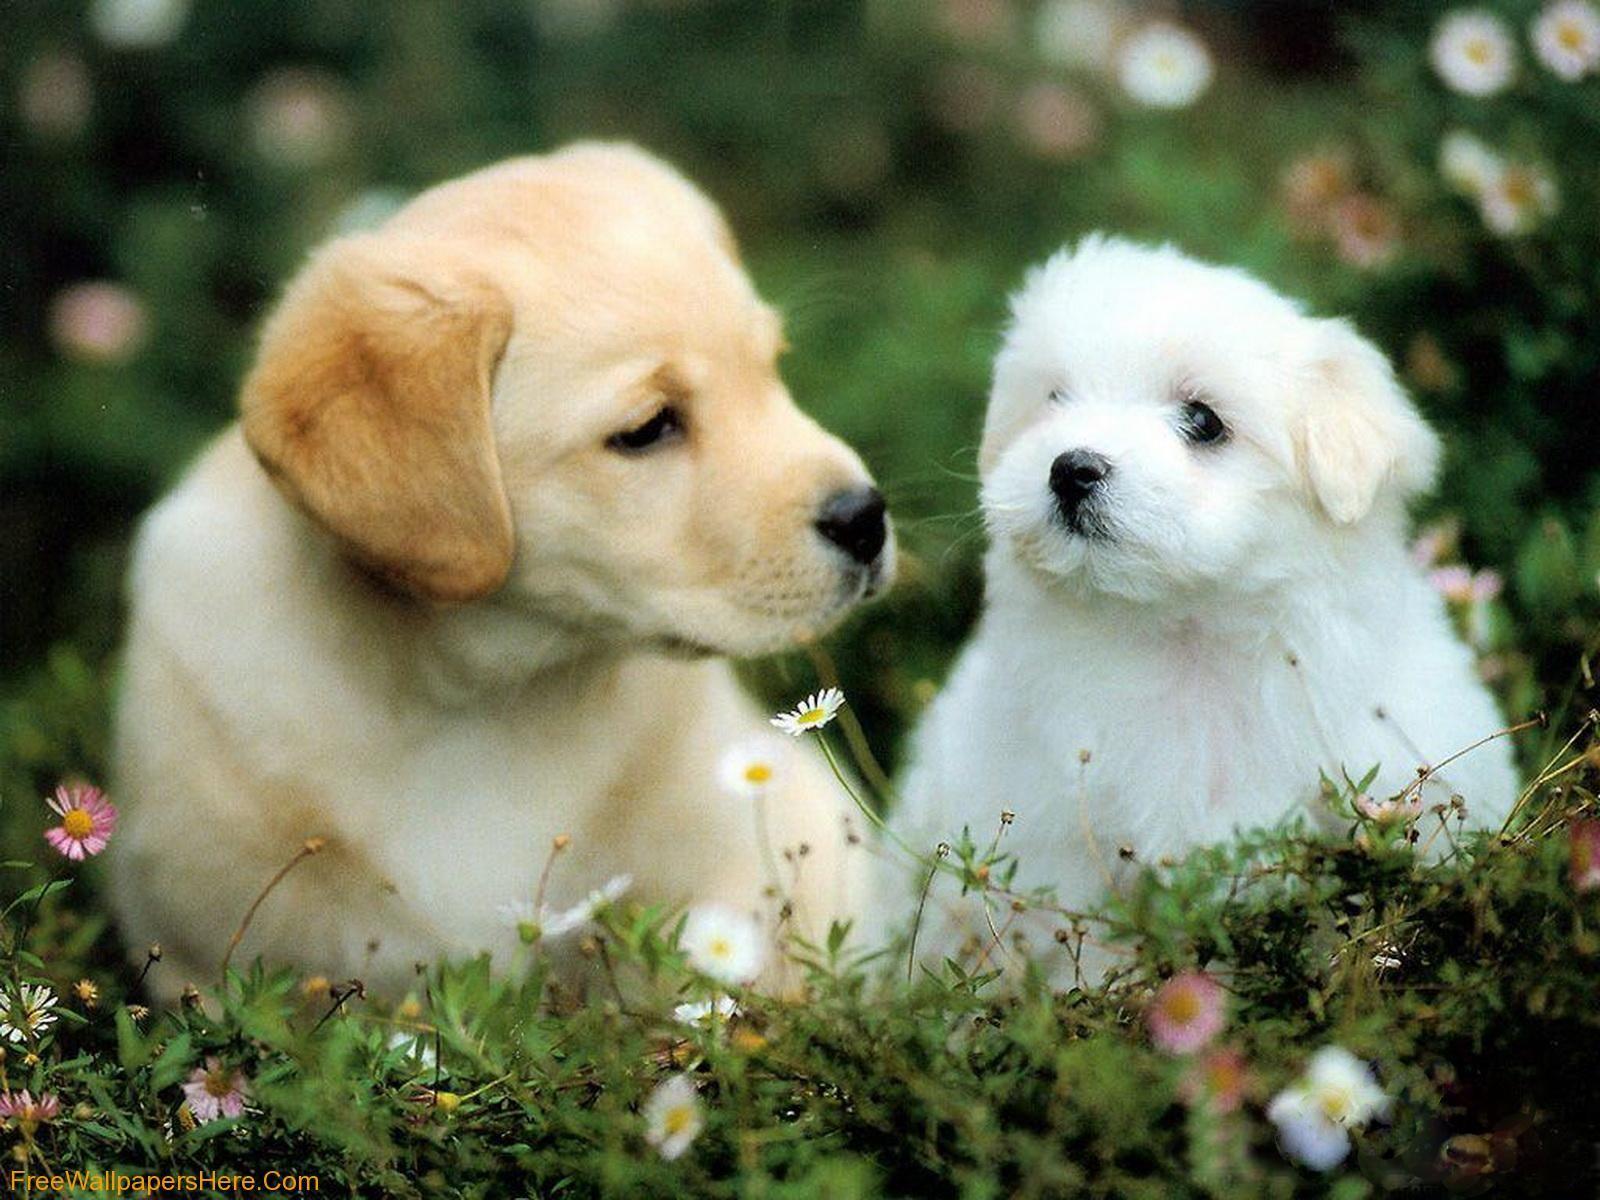 Wallpaper Gallery Cute Puppies Wallpaper Cute Puppy Wallpaper Cute Dog Wallpaper Cute Dogs And Puppies